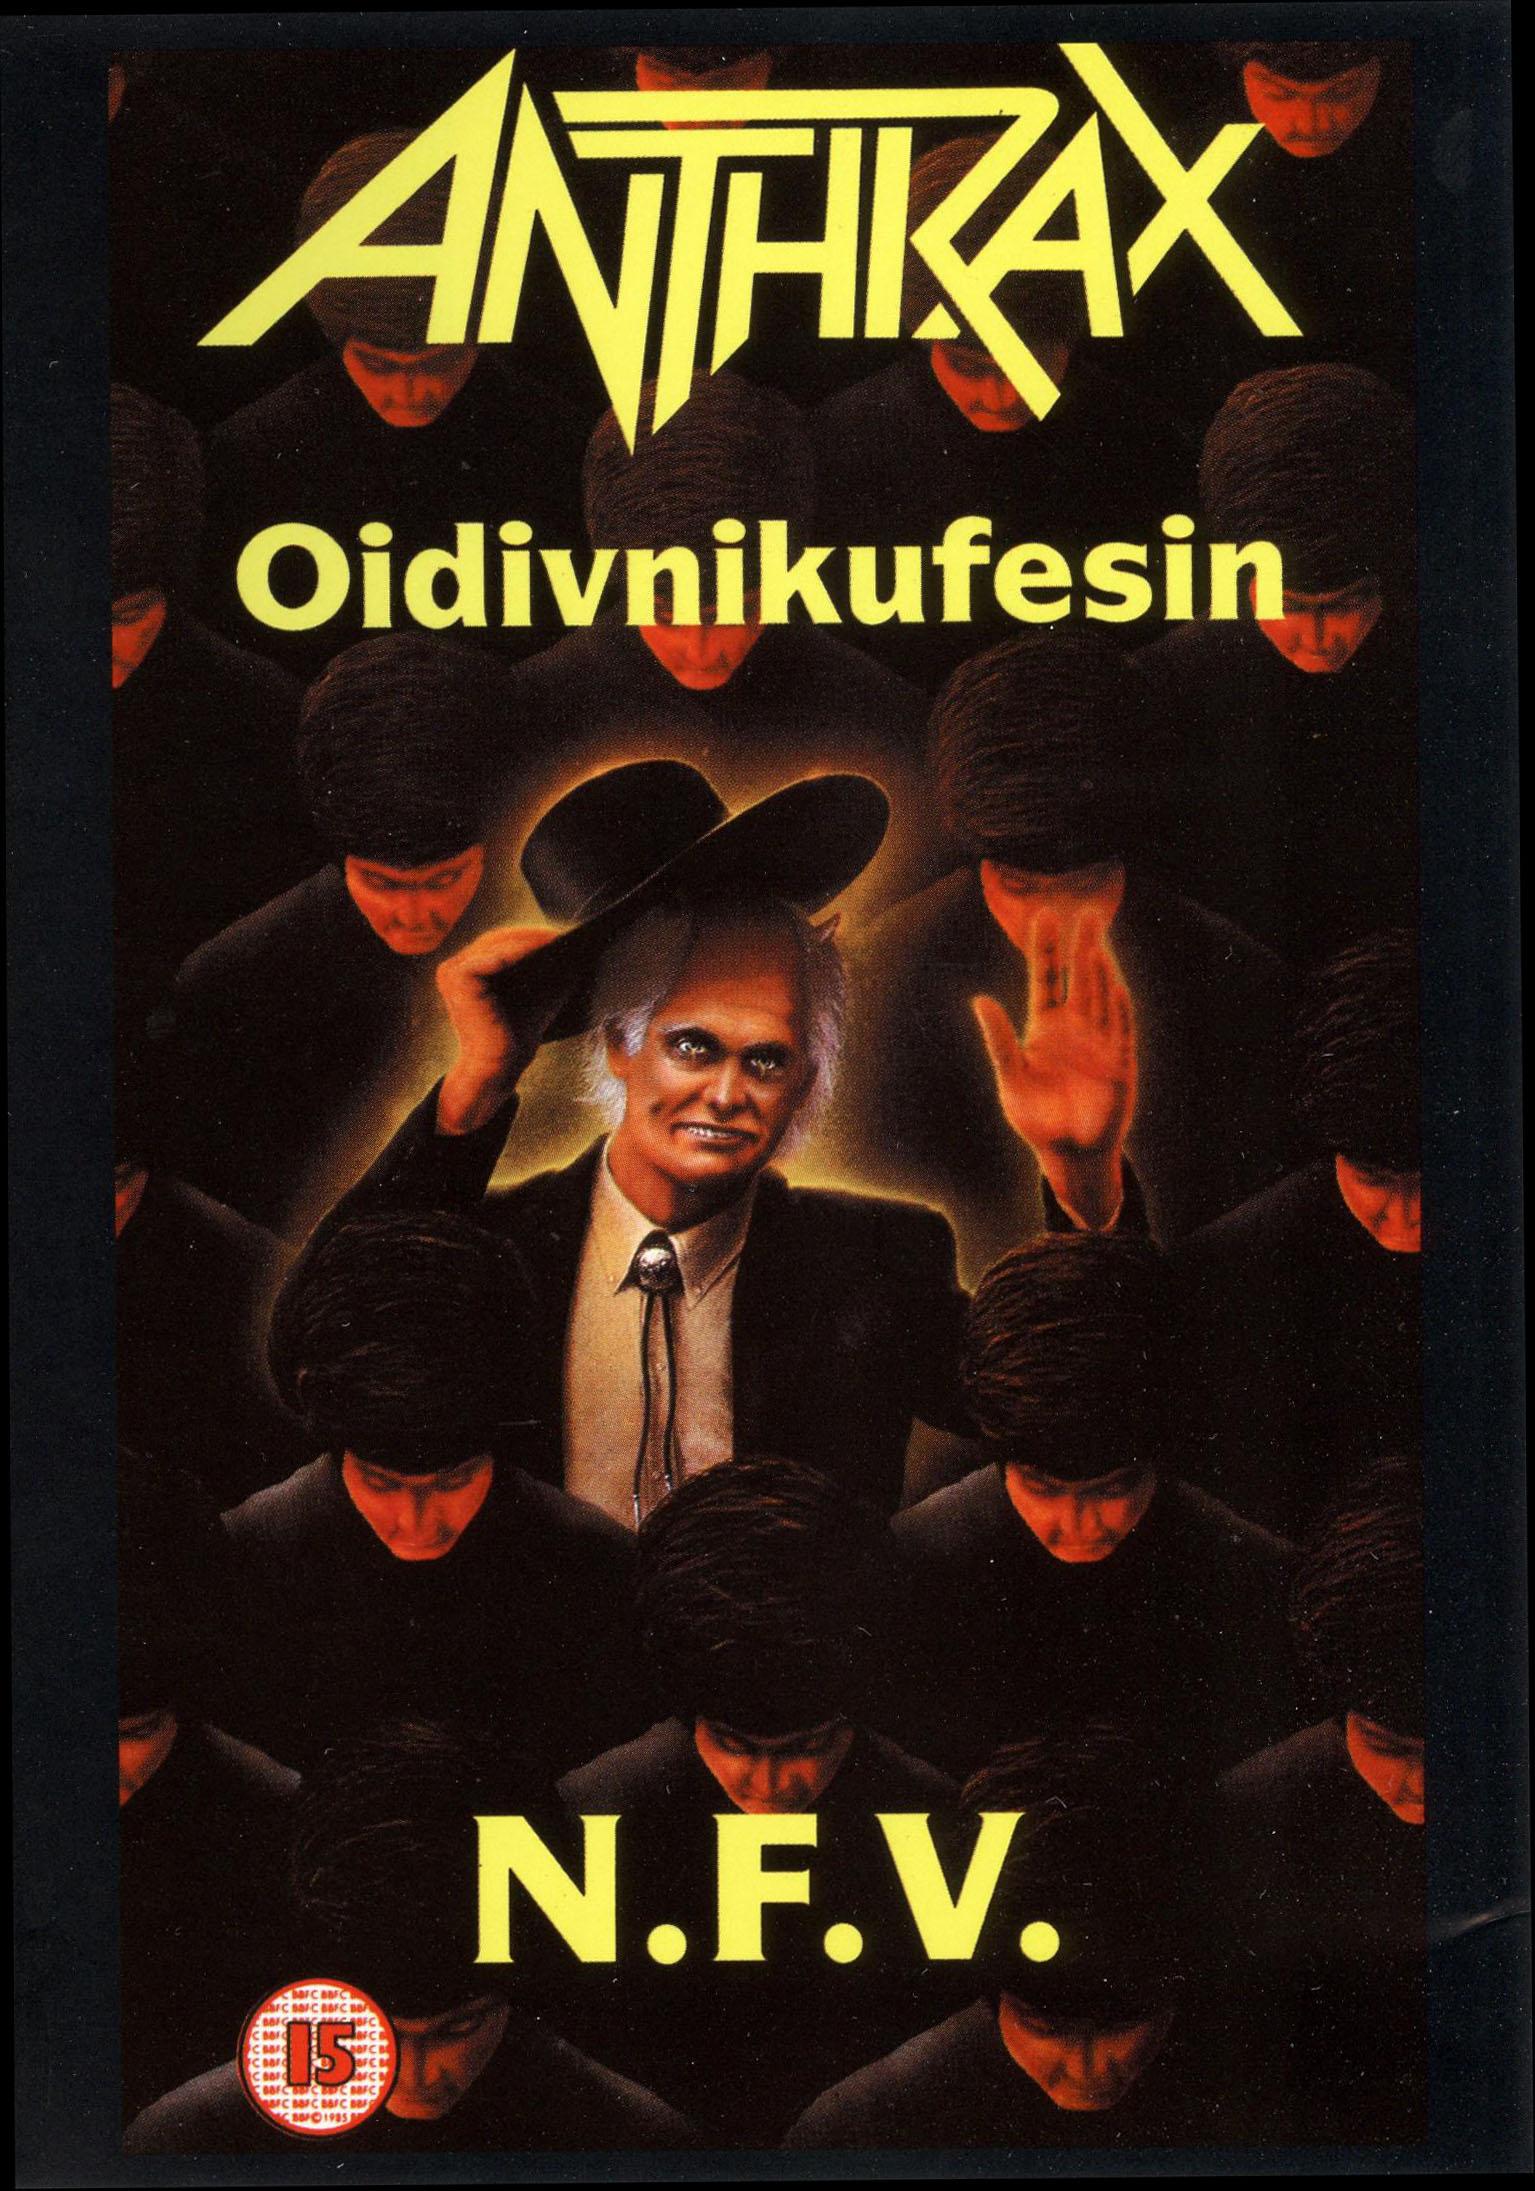 Anthrax: Oidivnikufesin (N.F.V.)